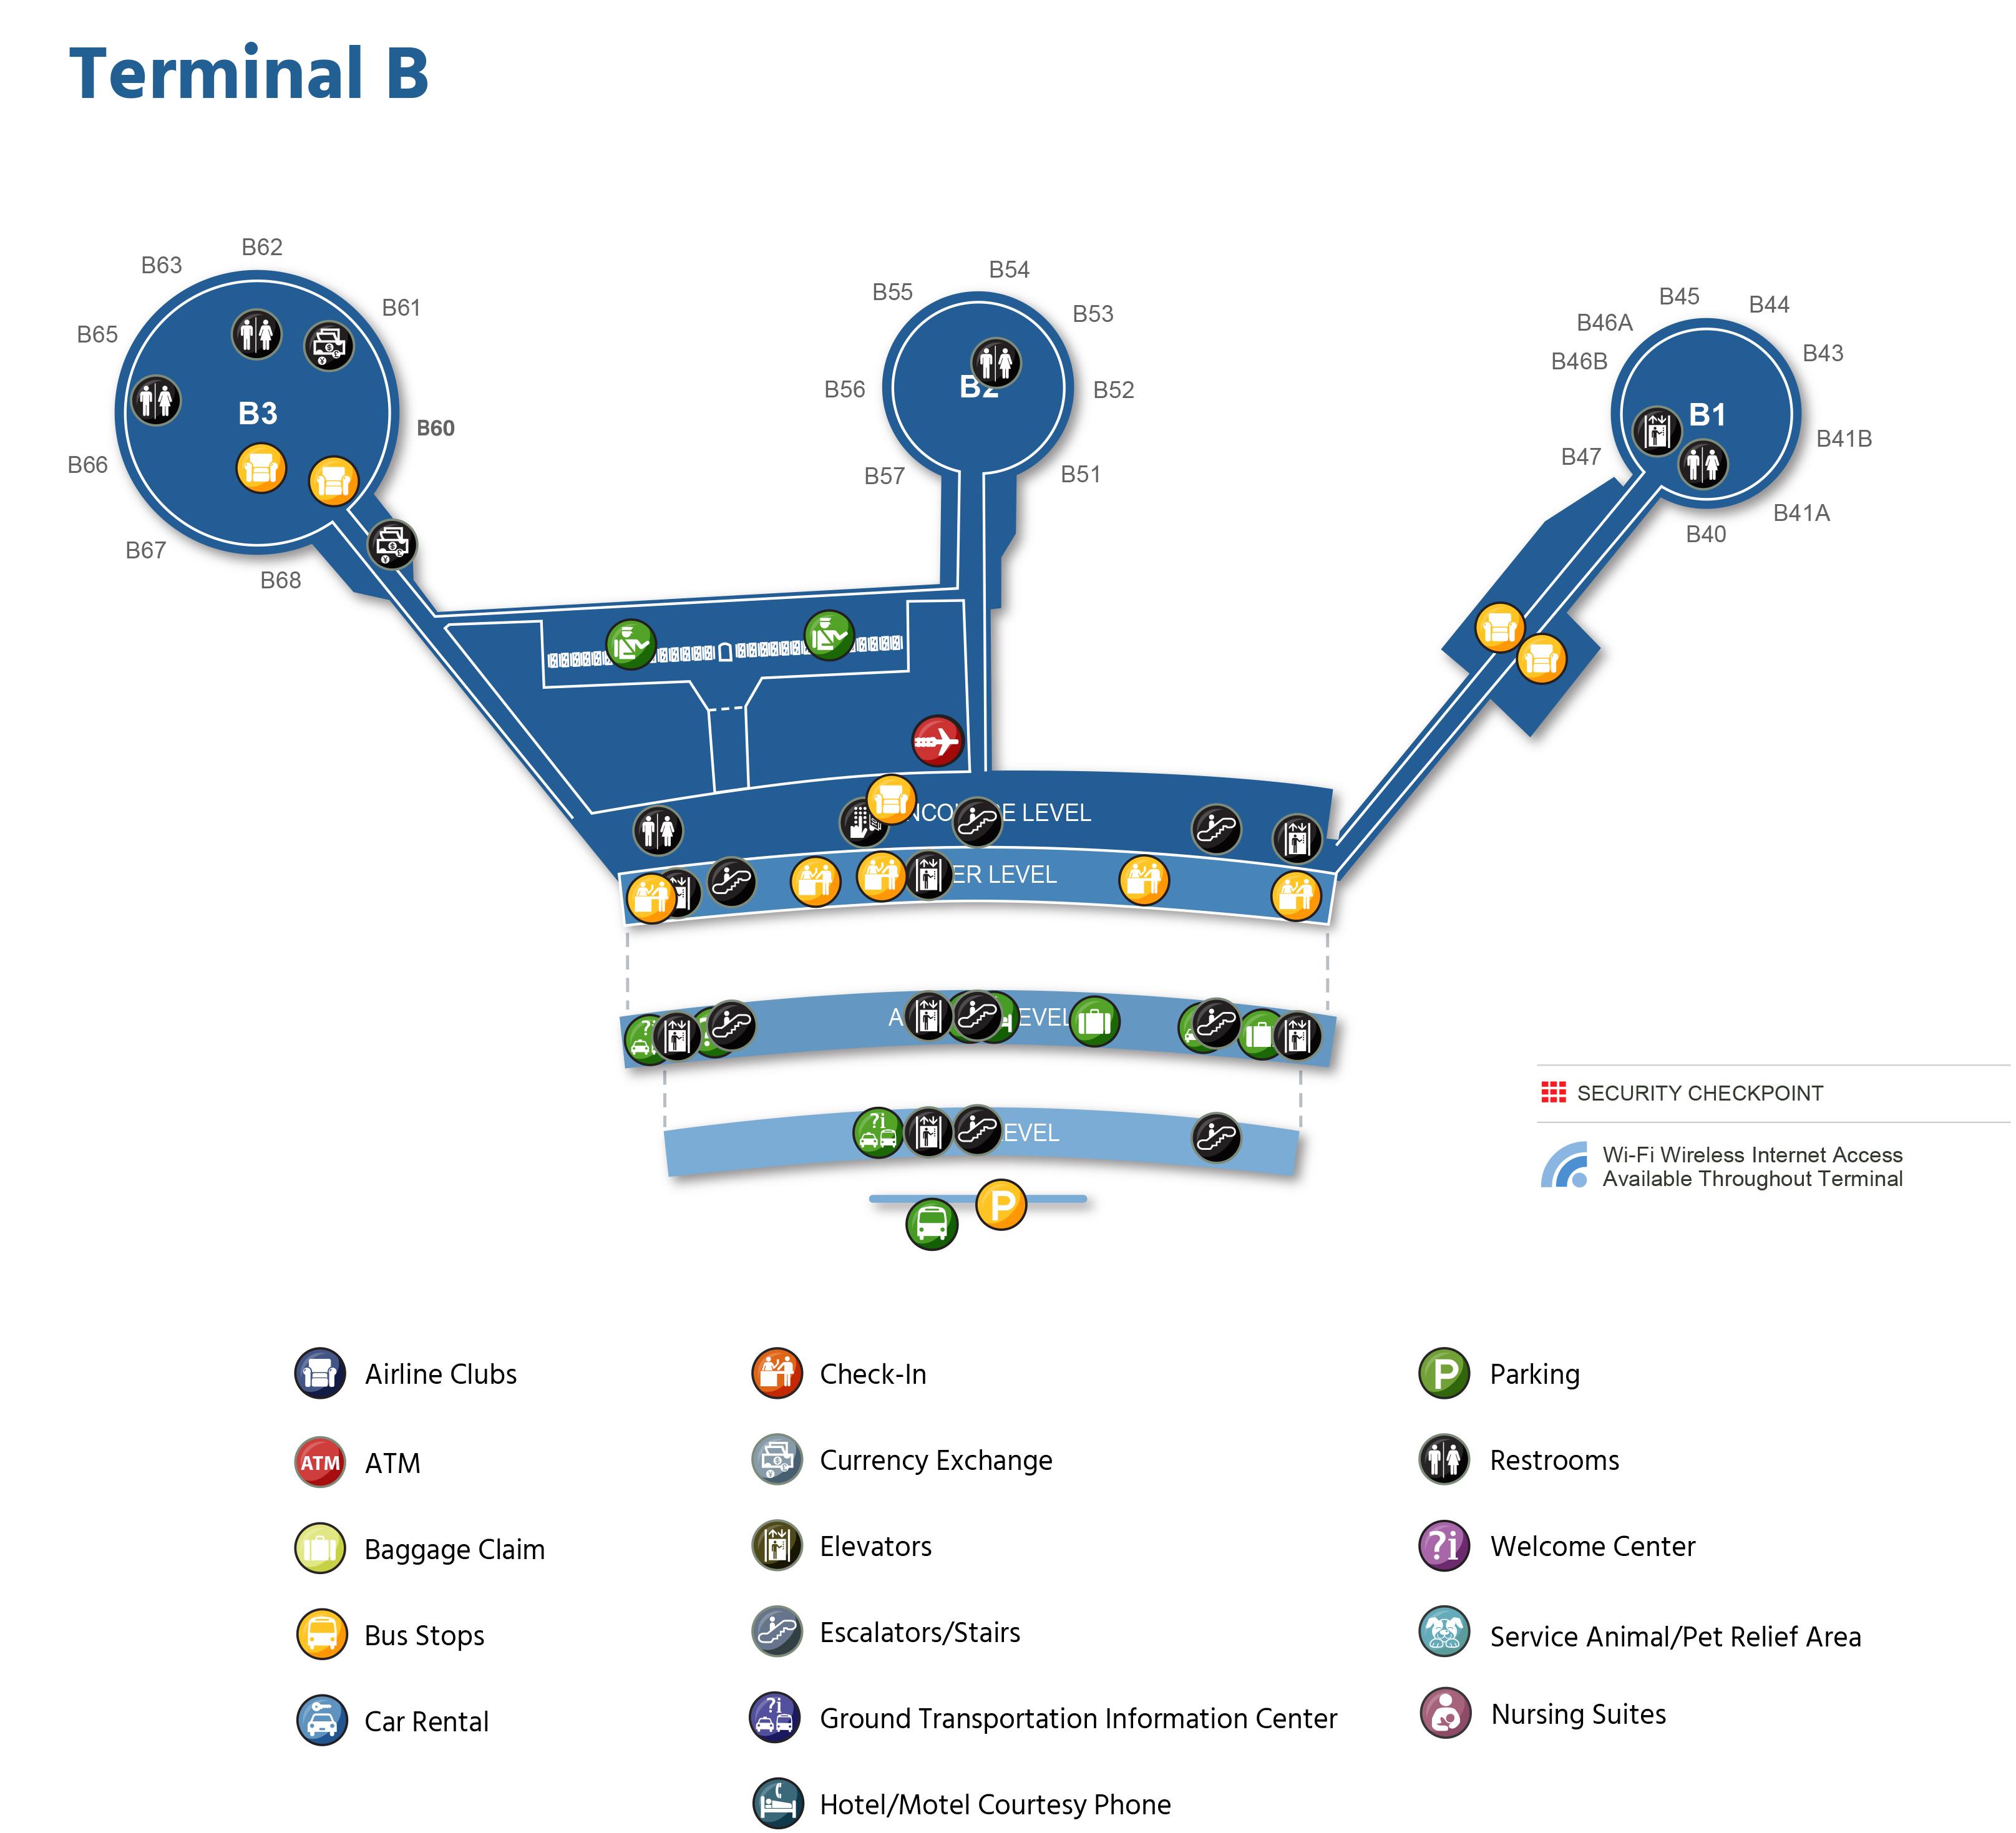 Newark Liberty International Airport Map (EWR) - Printable Terminal ...